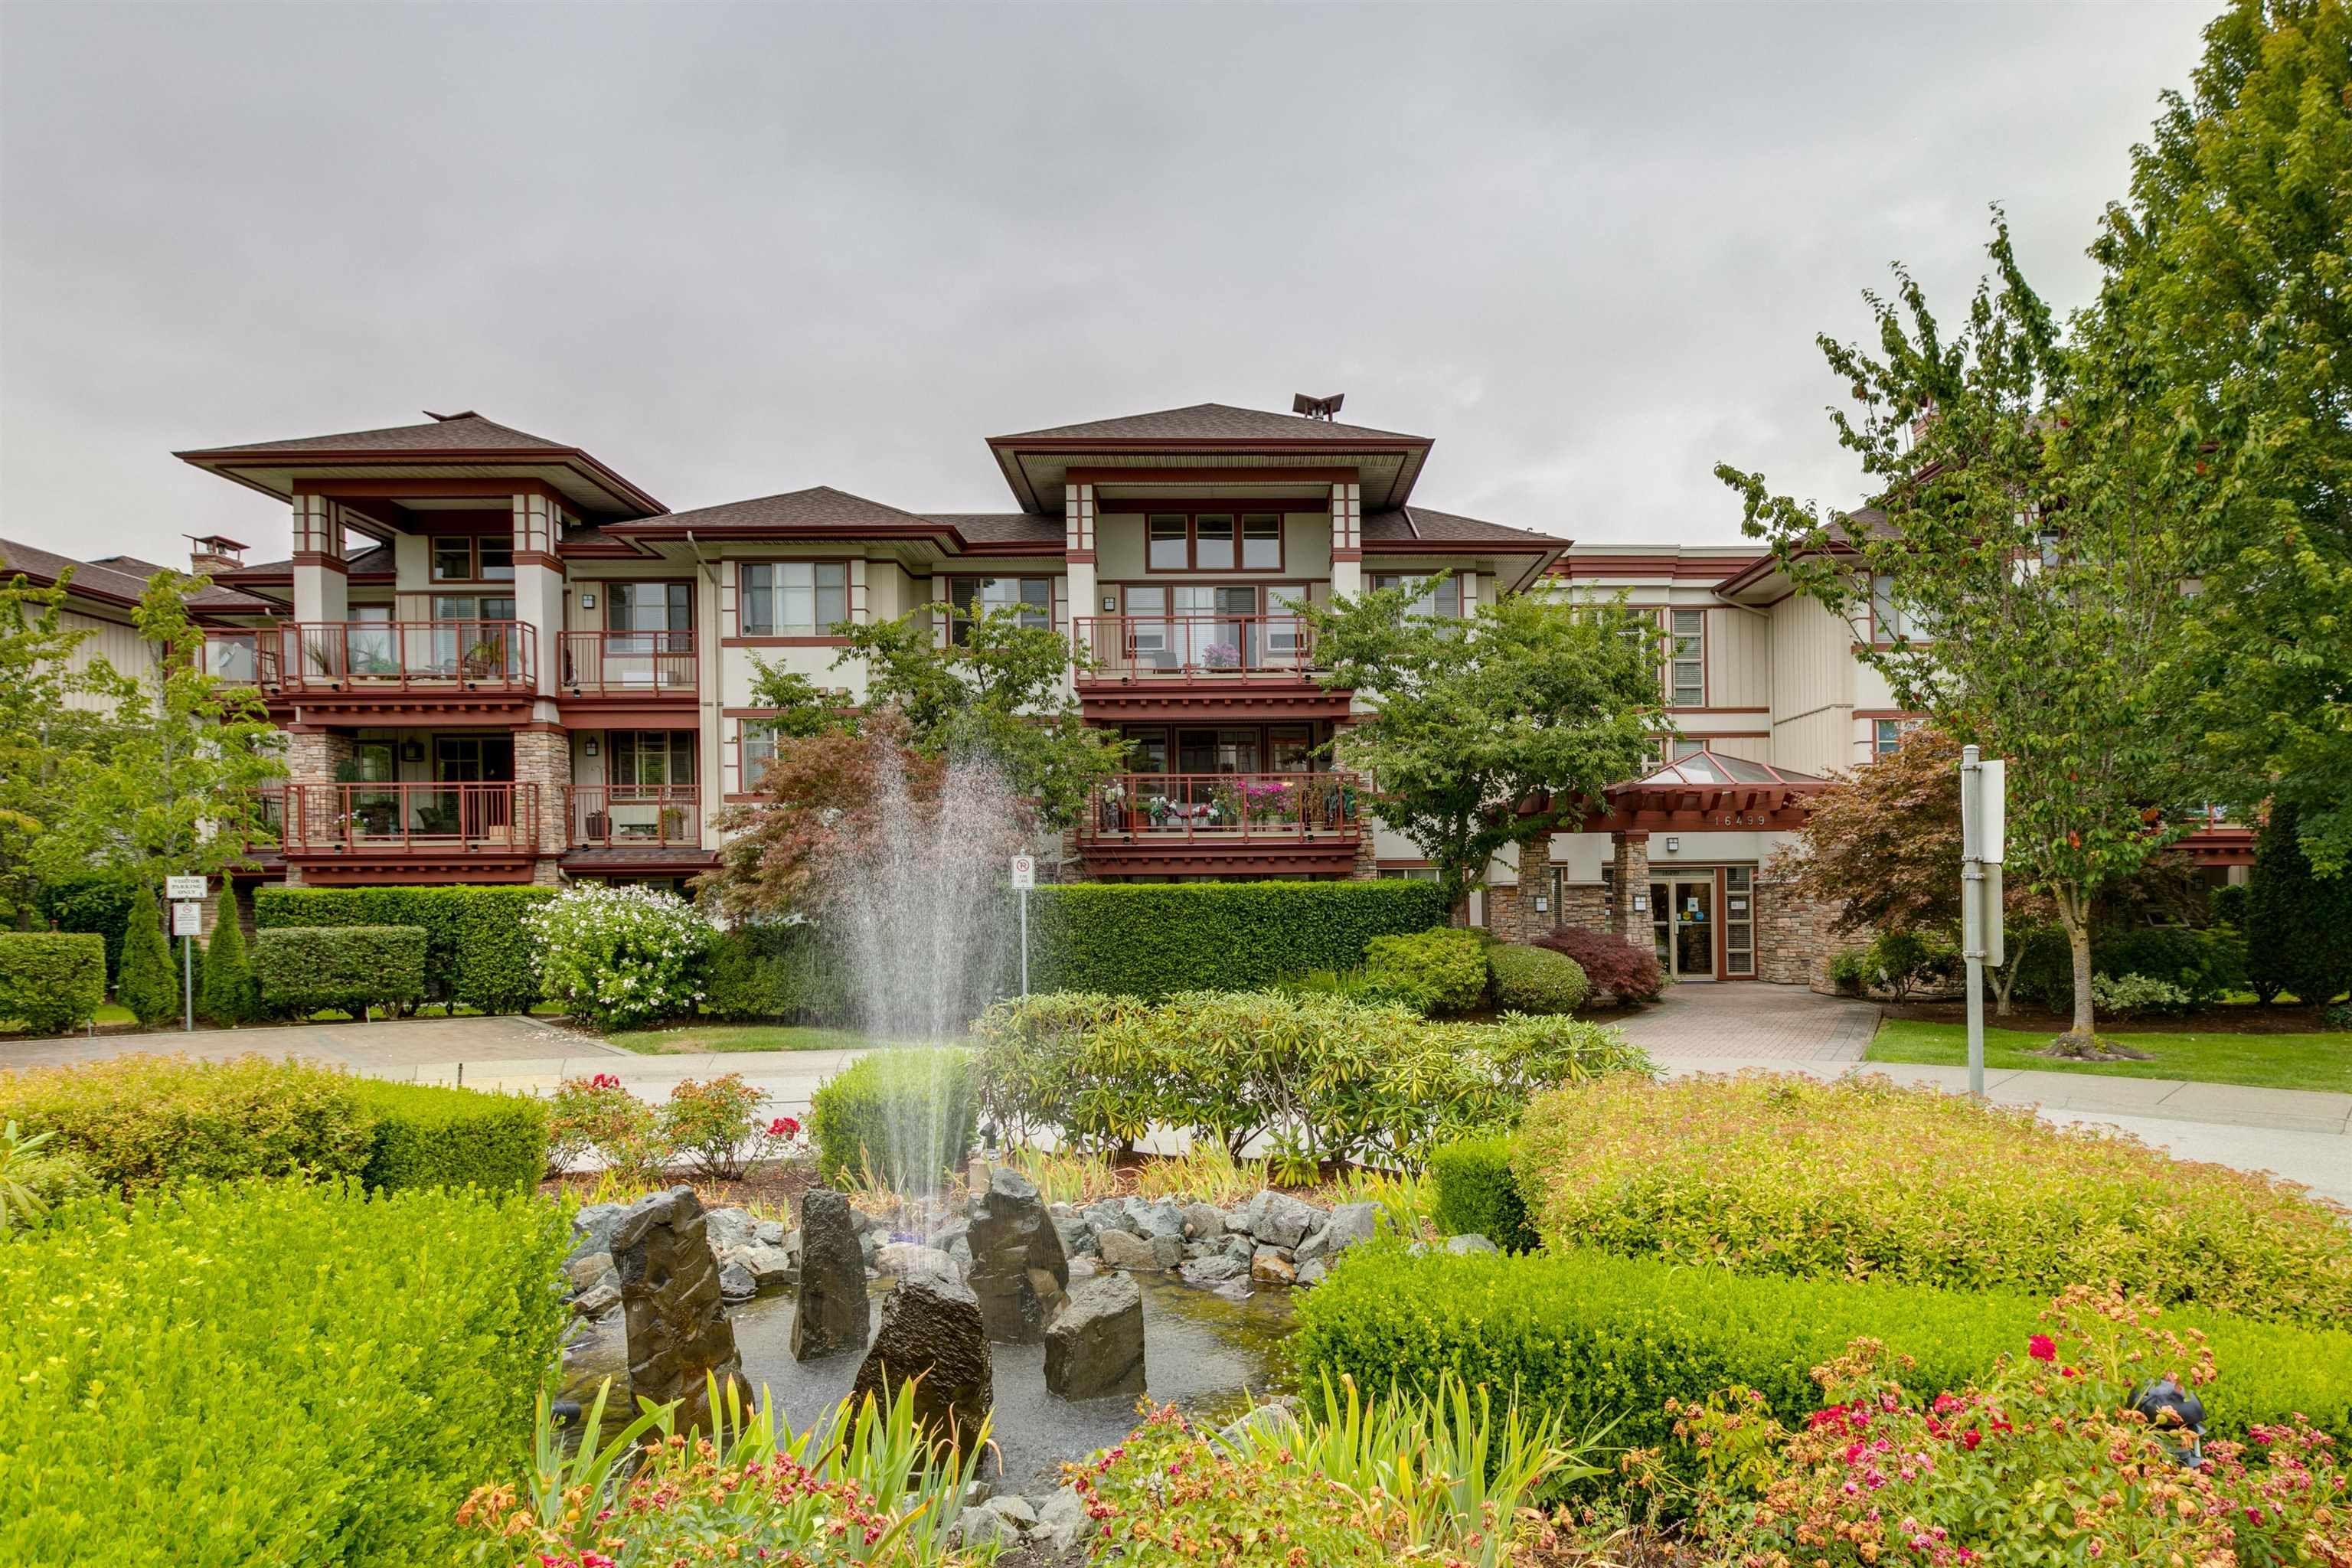 Main Photo: 210 16499 64 Avenue in Surrey: Cloverdale BC Condo for sale (Cloverdale)  : MLS®# R2610364